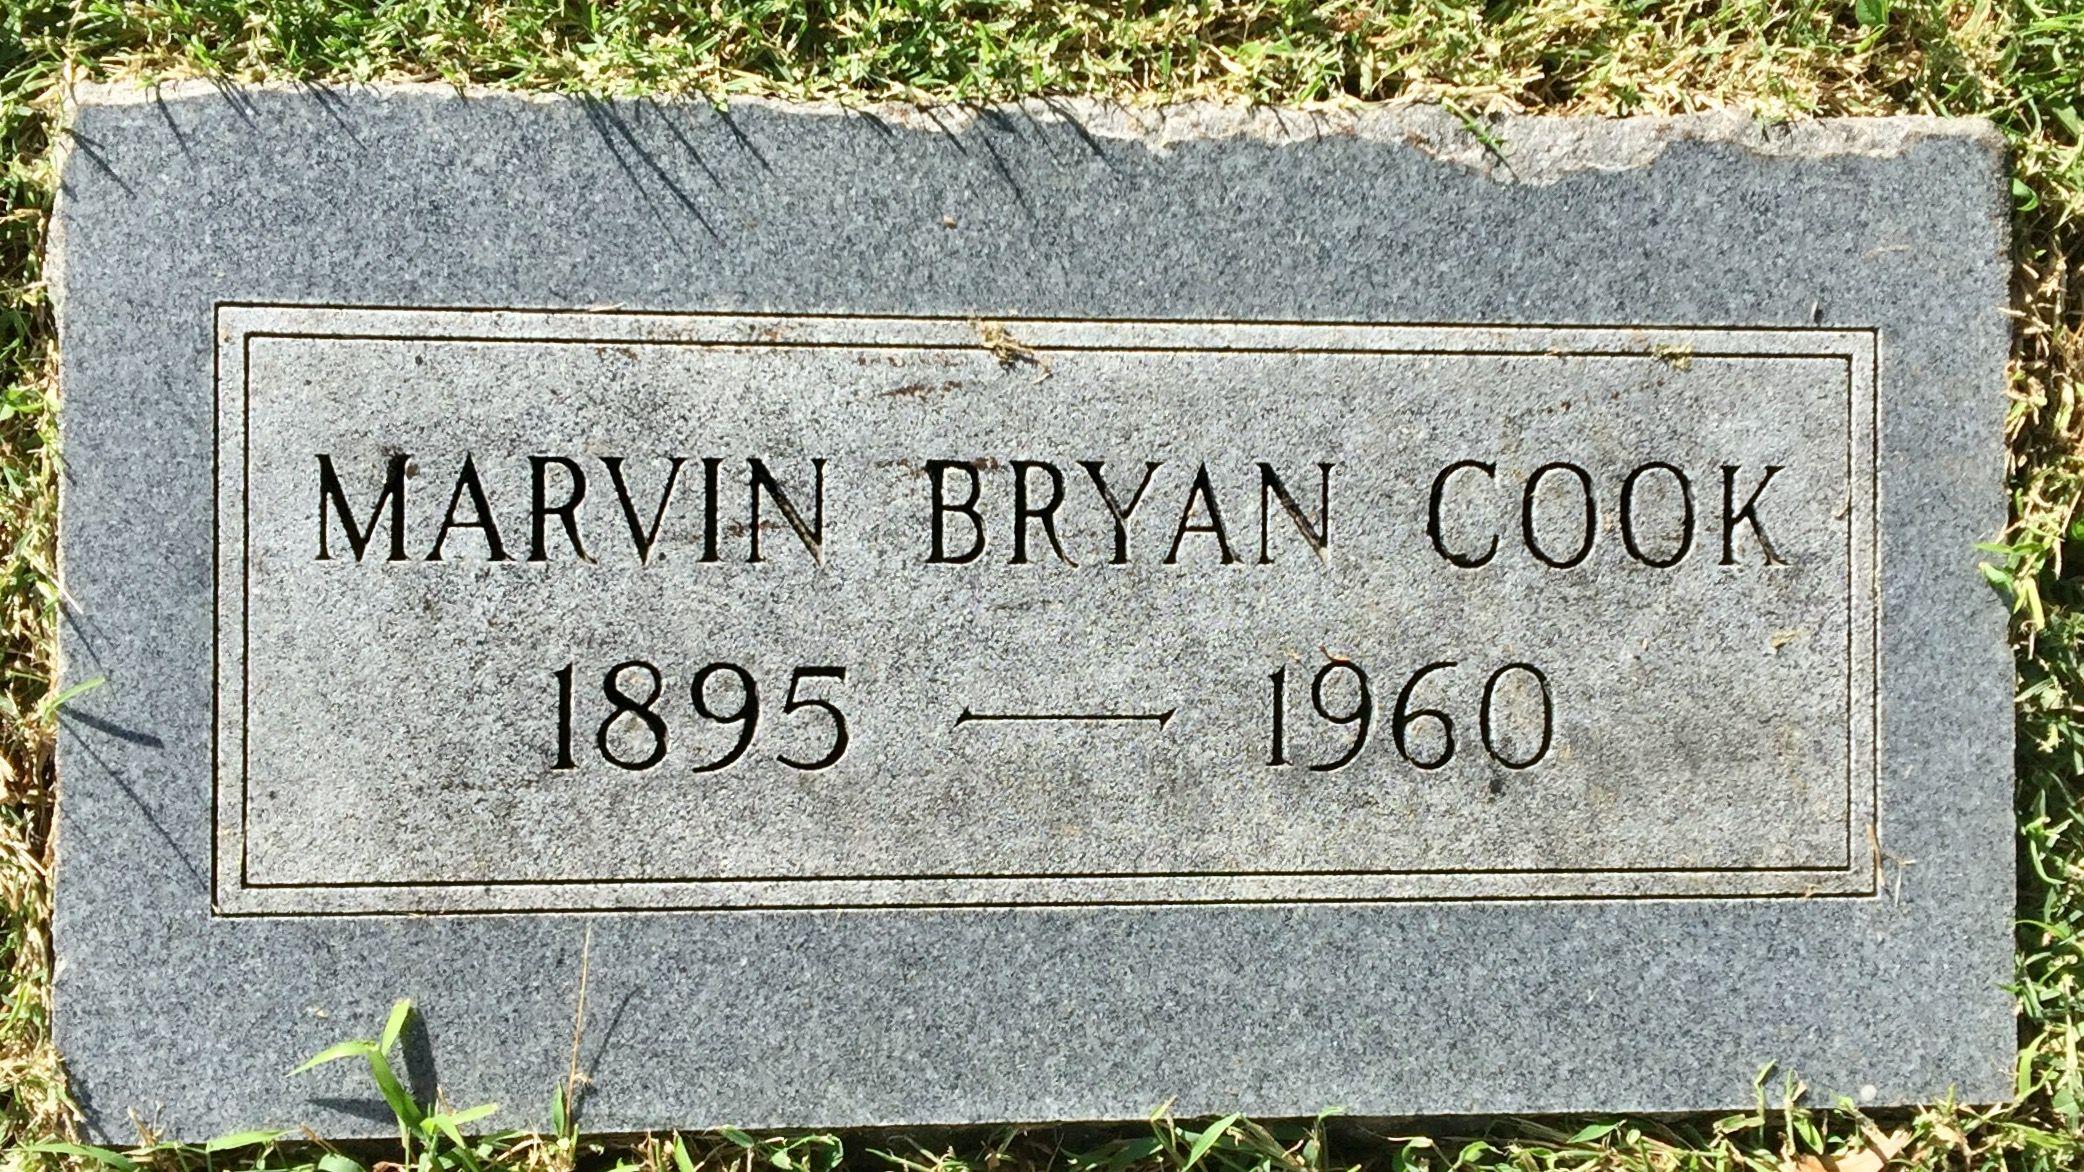 Marvin Bryan Cook